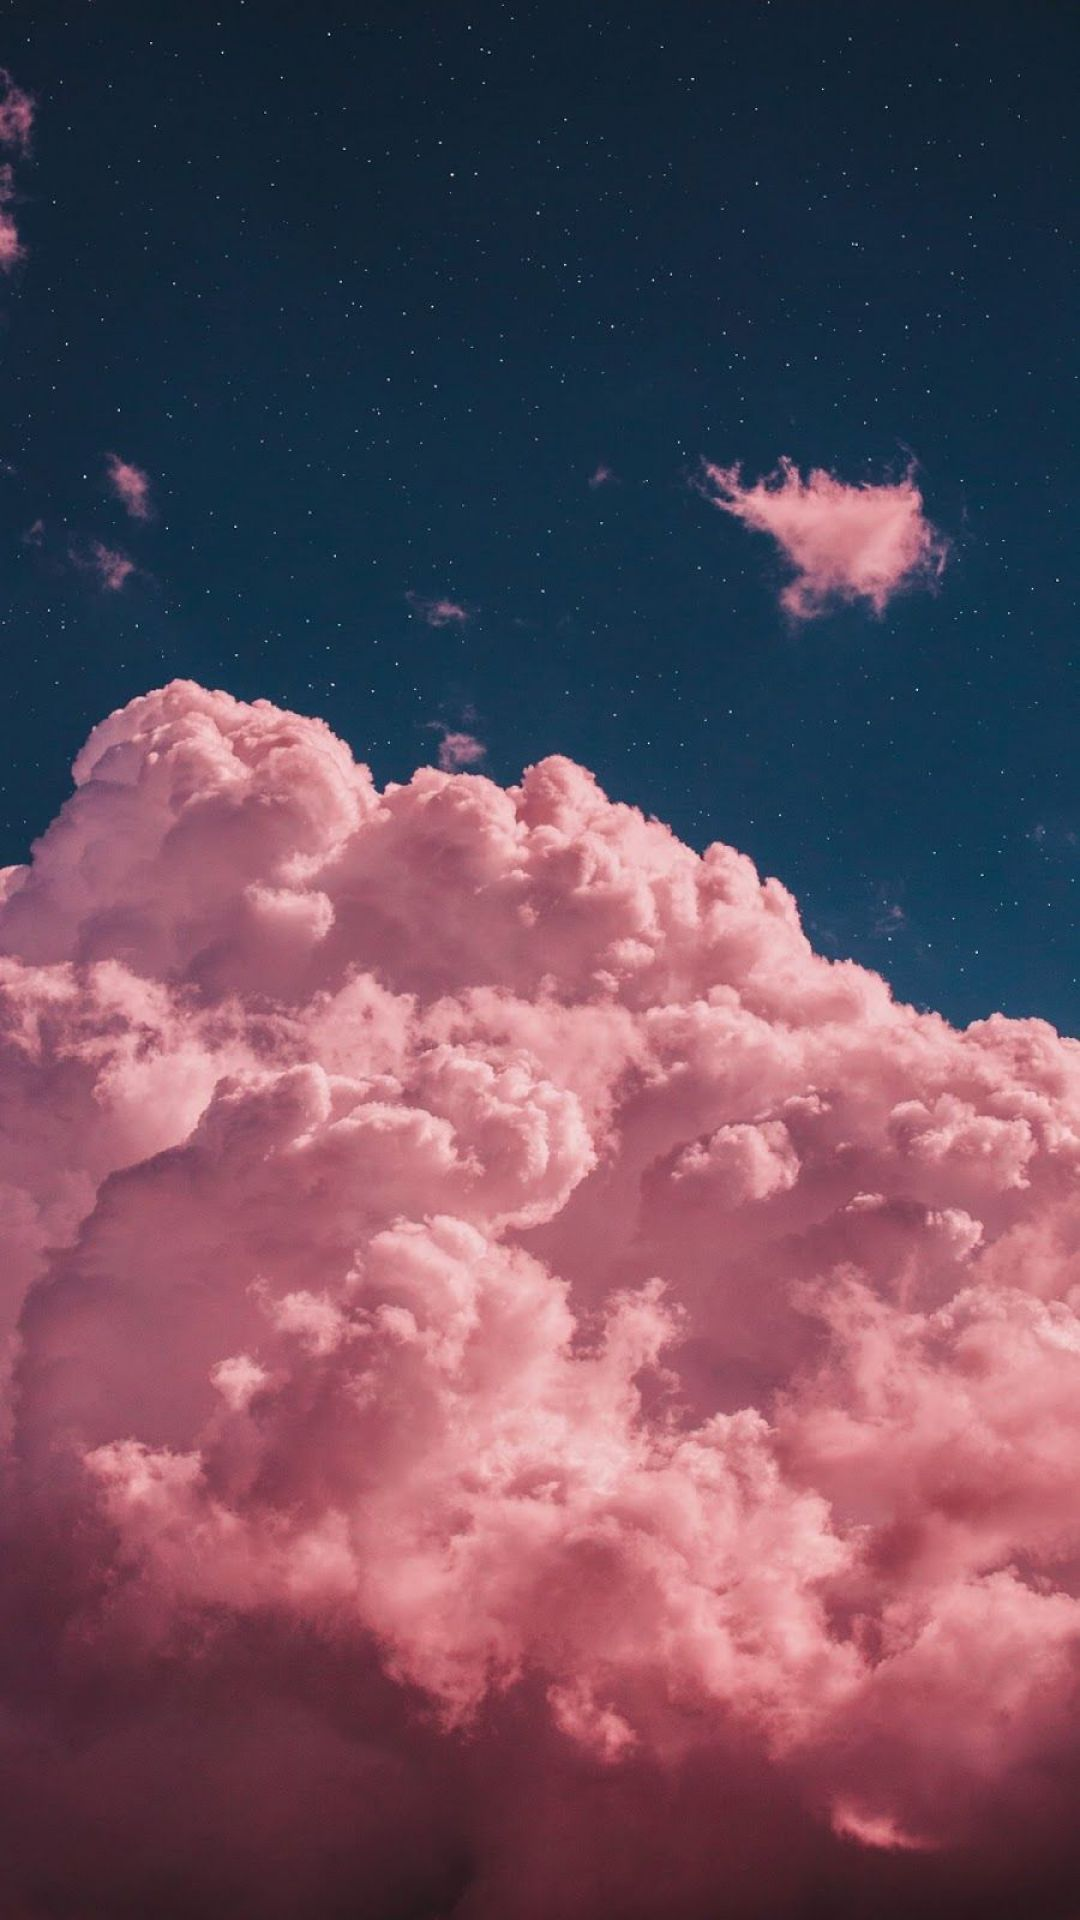 6175 3d Abstract Images Hd Photos 1080p Cloud Wallpaper Clouds Wallpaper Iphone Pink Clouds Wallpaper Aesthetic clouds desktop wallpaper hd